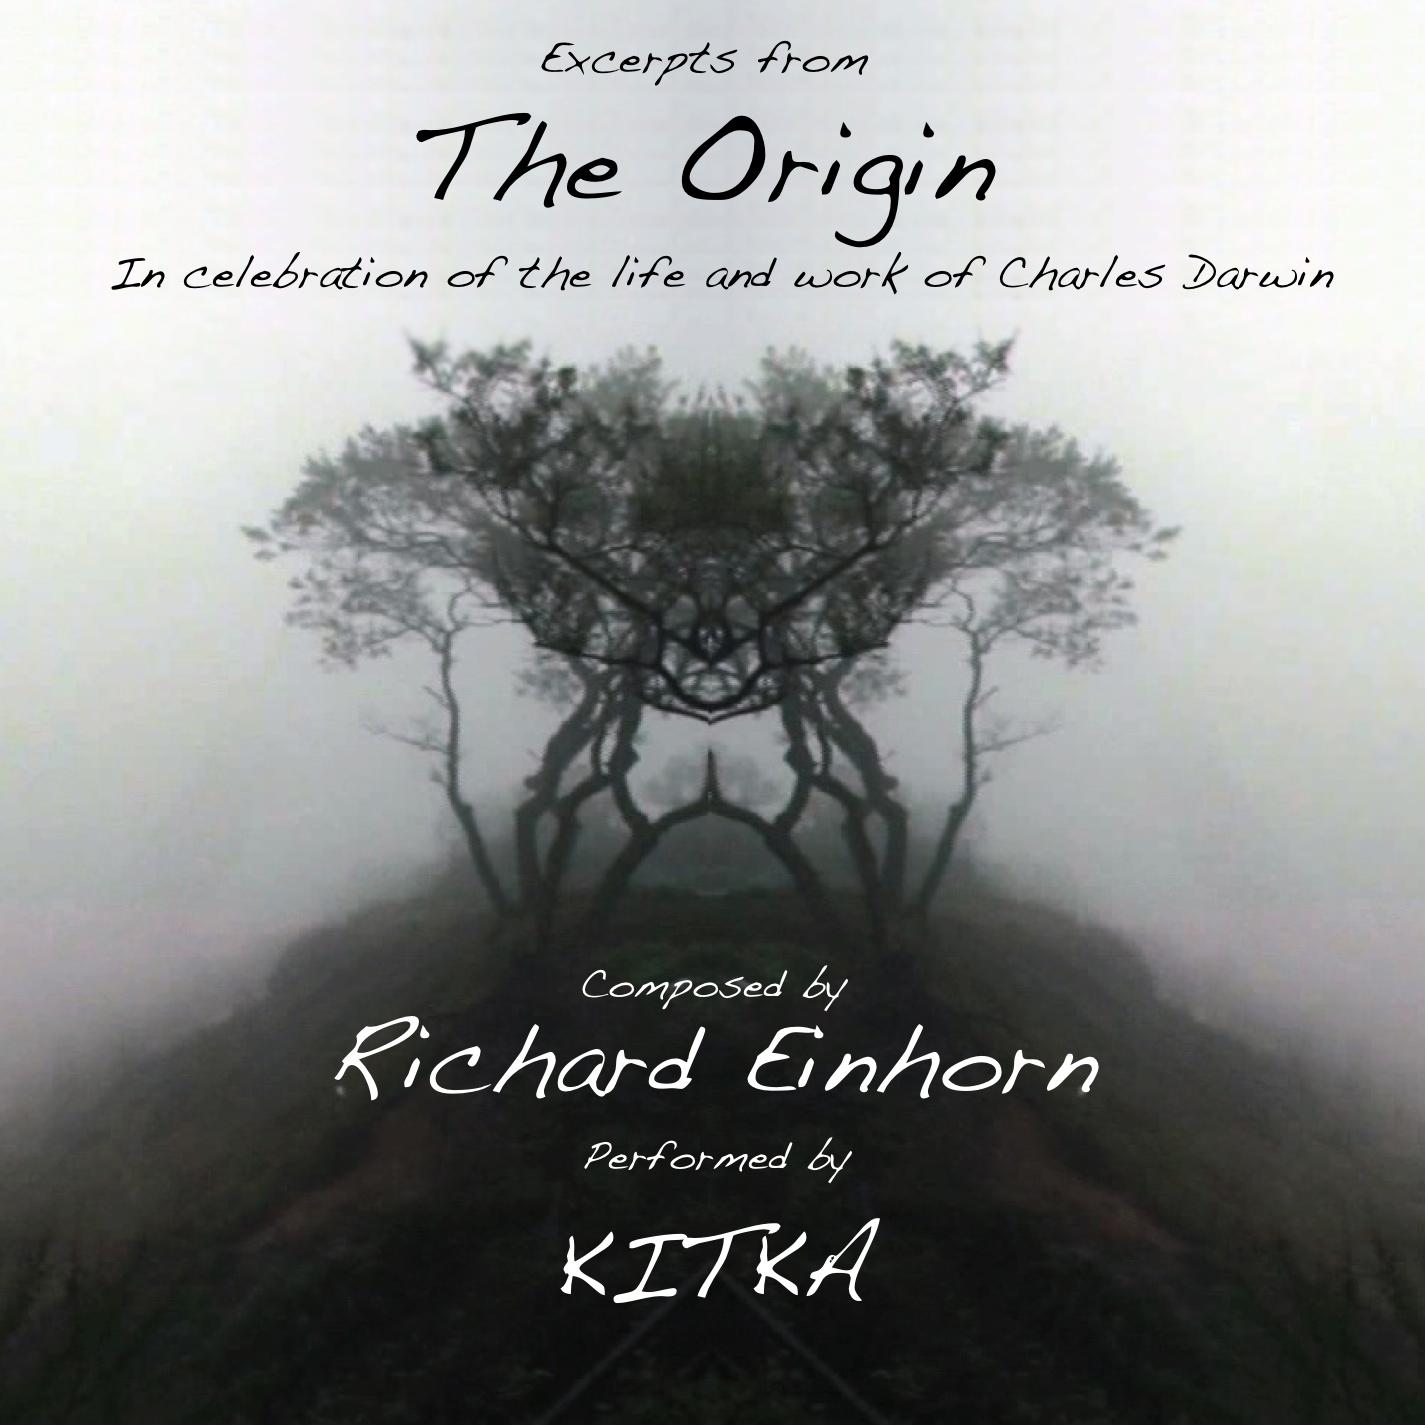 THE ORIGIN - (CD featuring KKITKA)